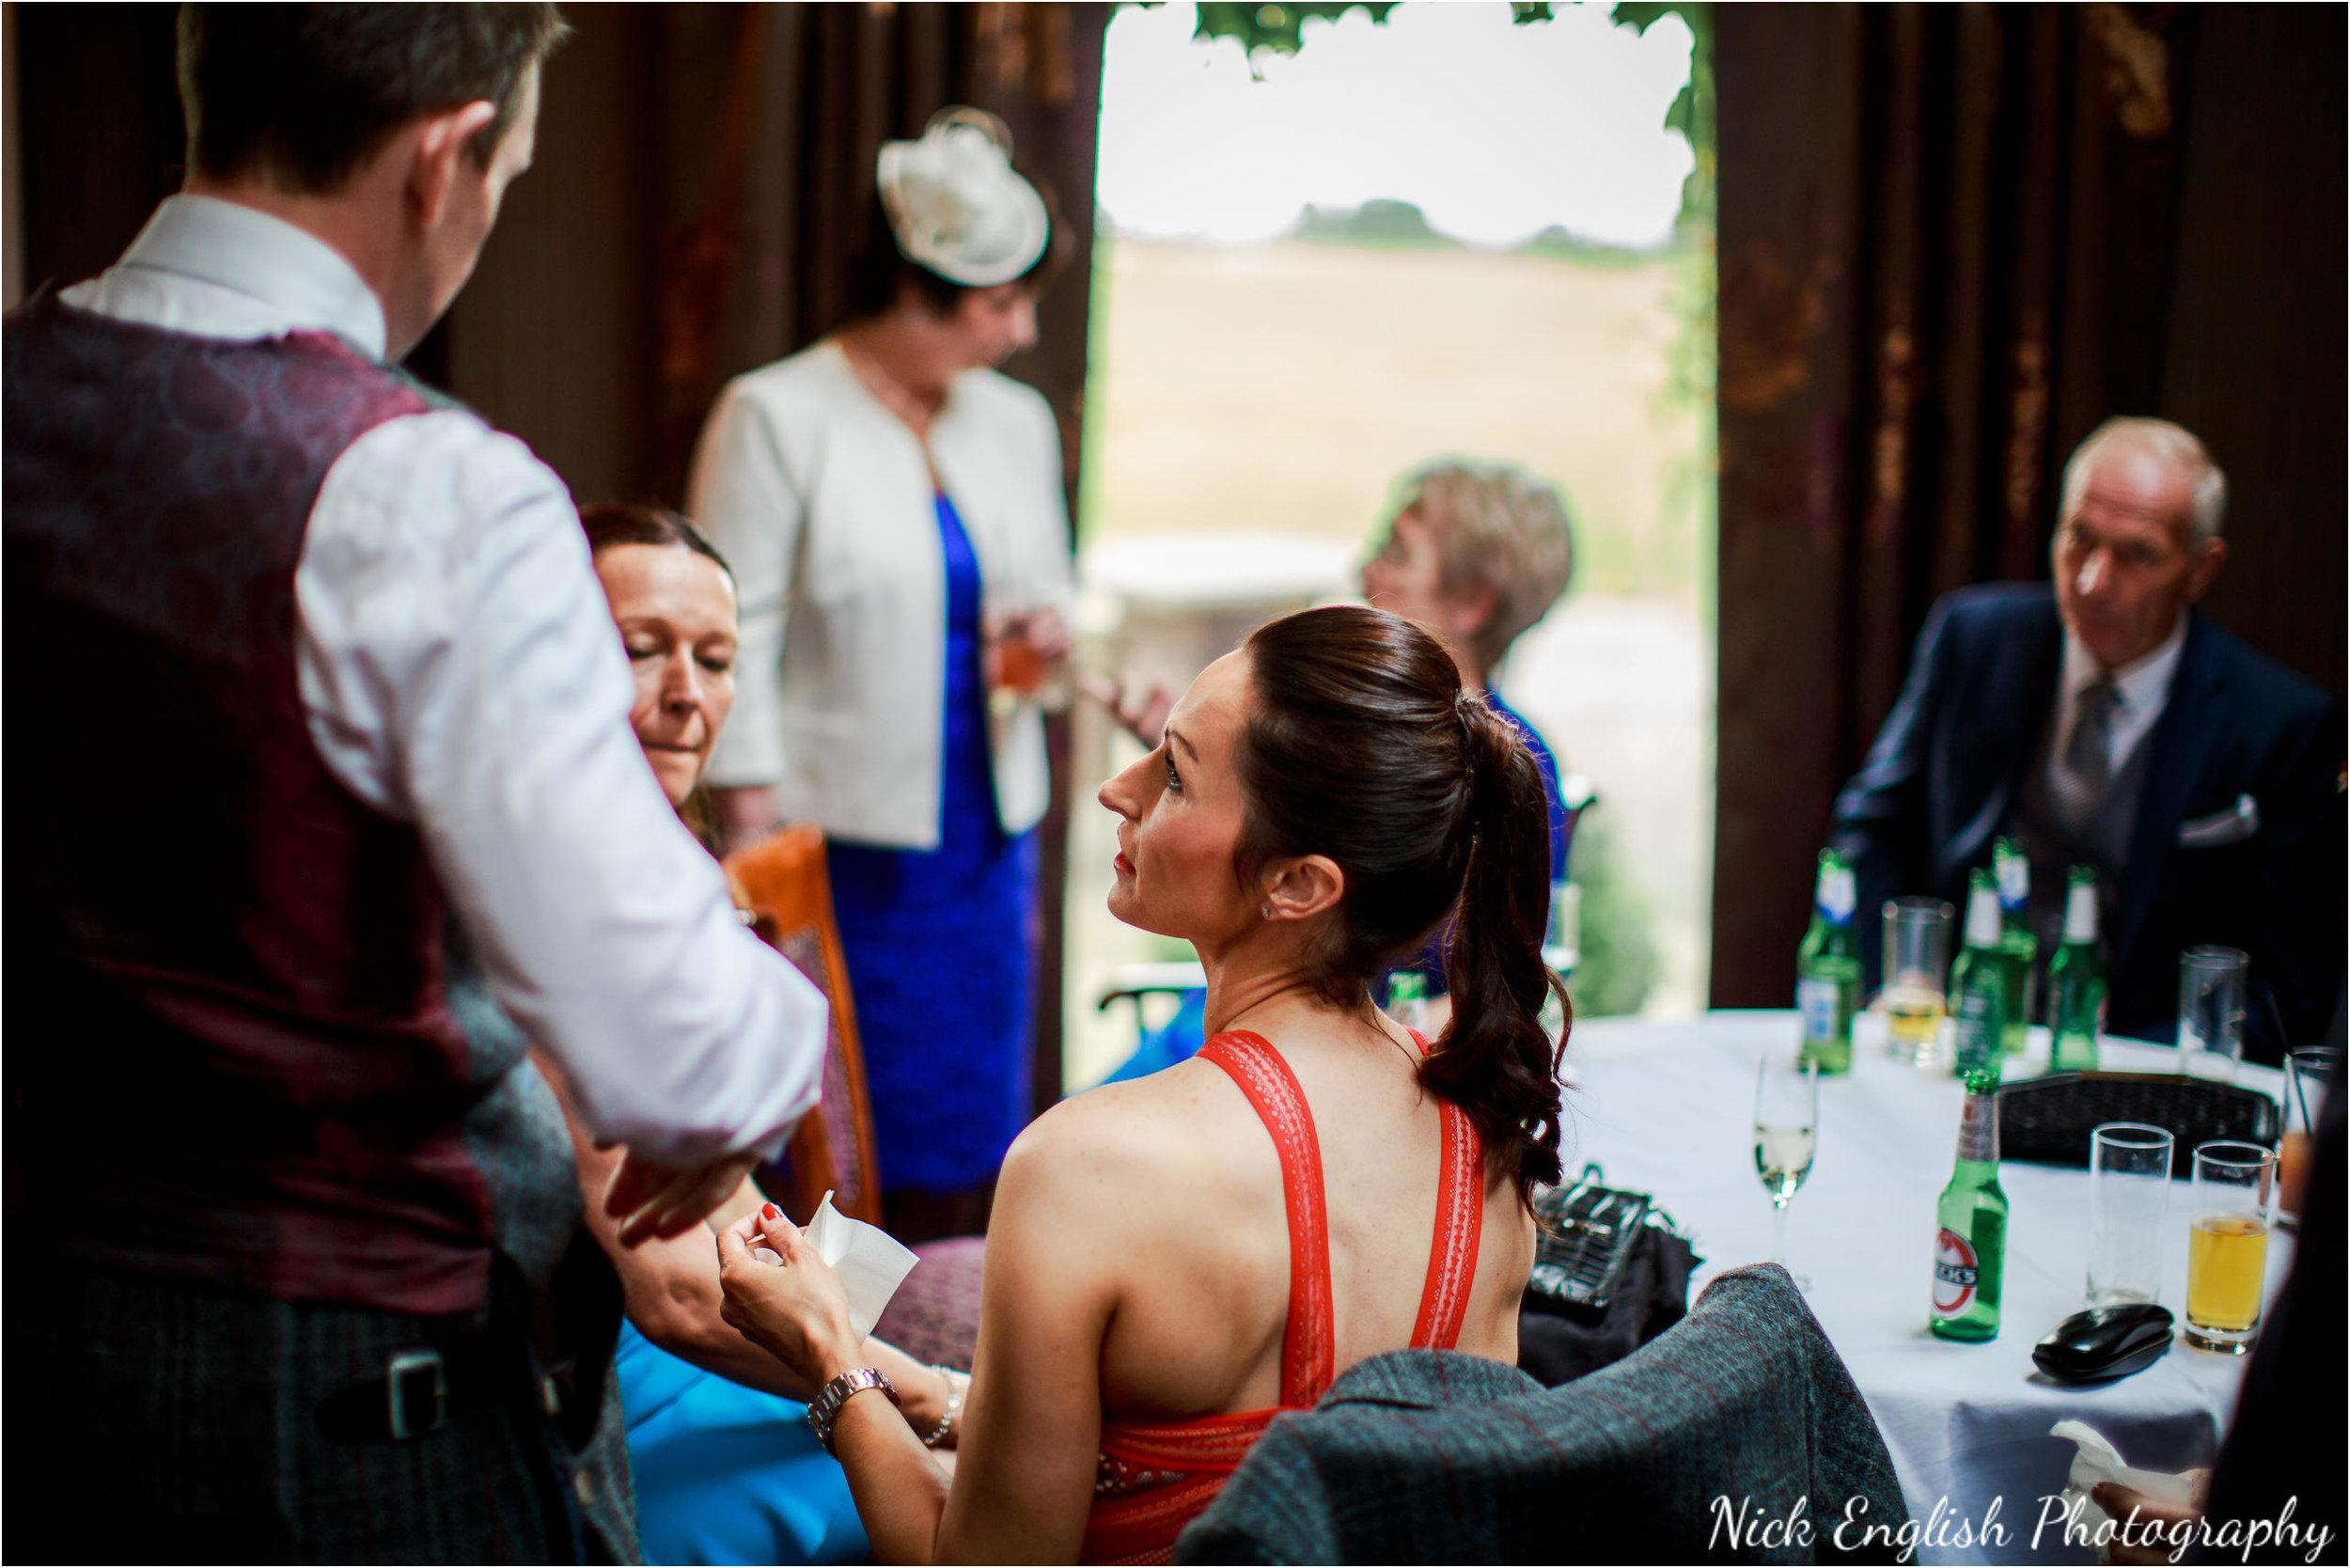 Stacey-Ash-Wedding-Photographs-Stanley-House-Preston-Lancashire-114.jpg